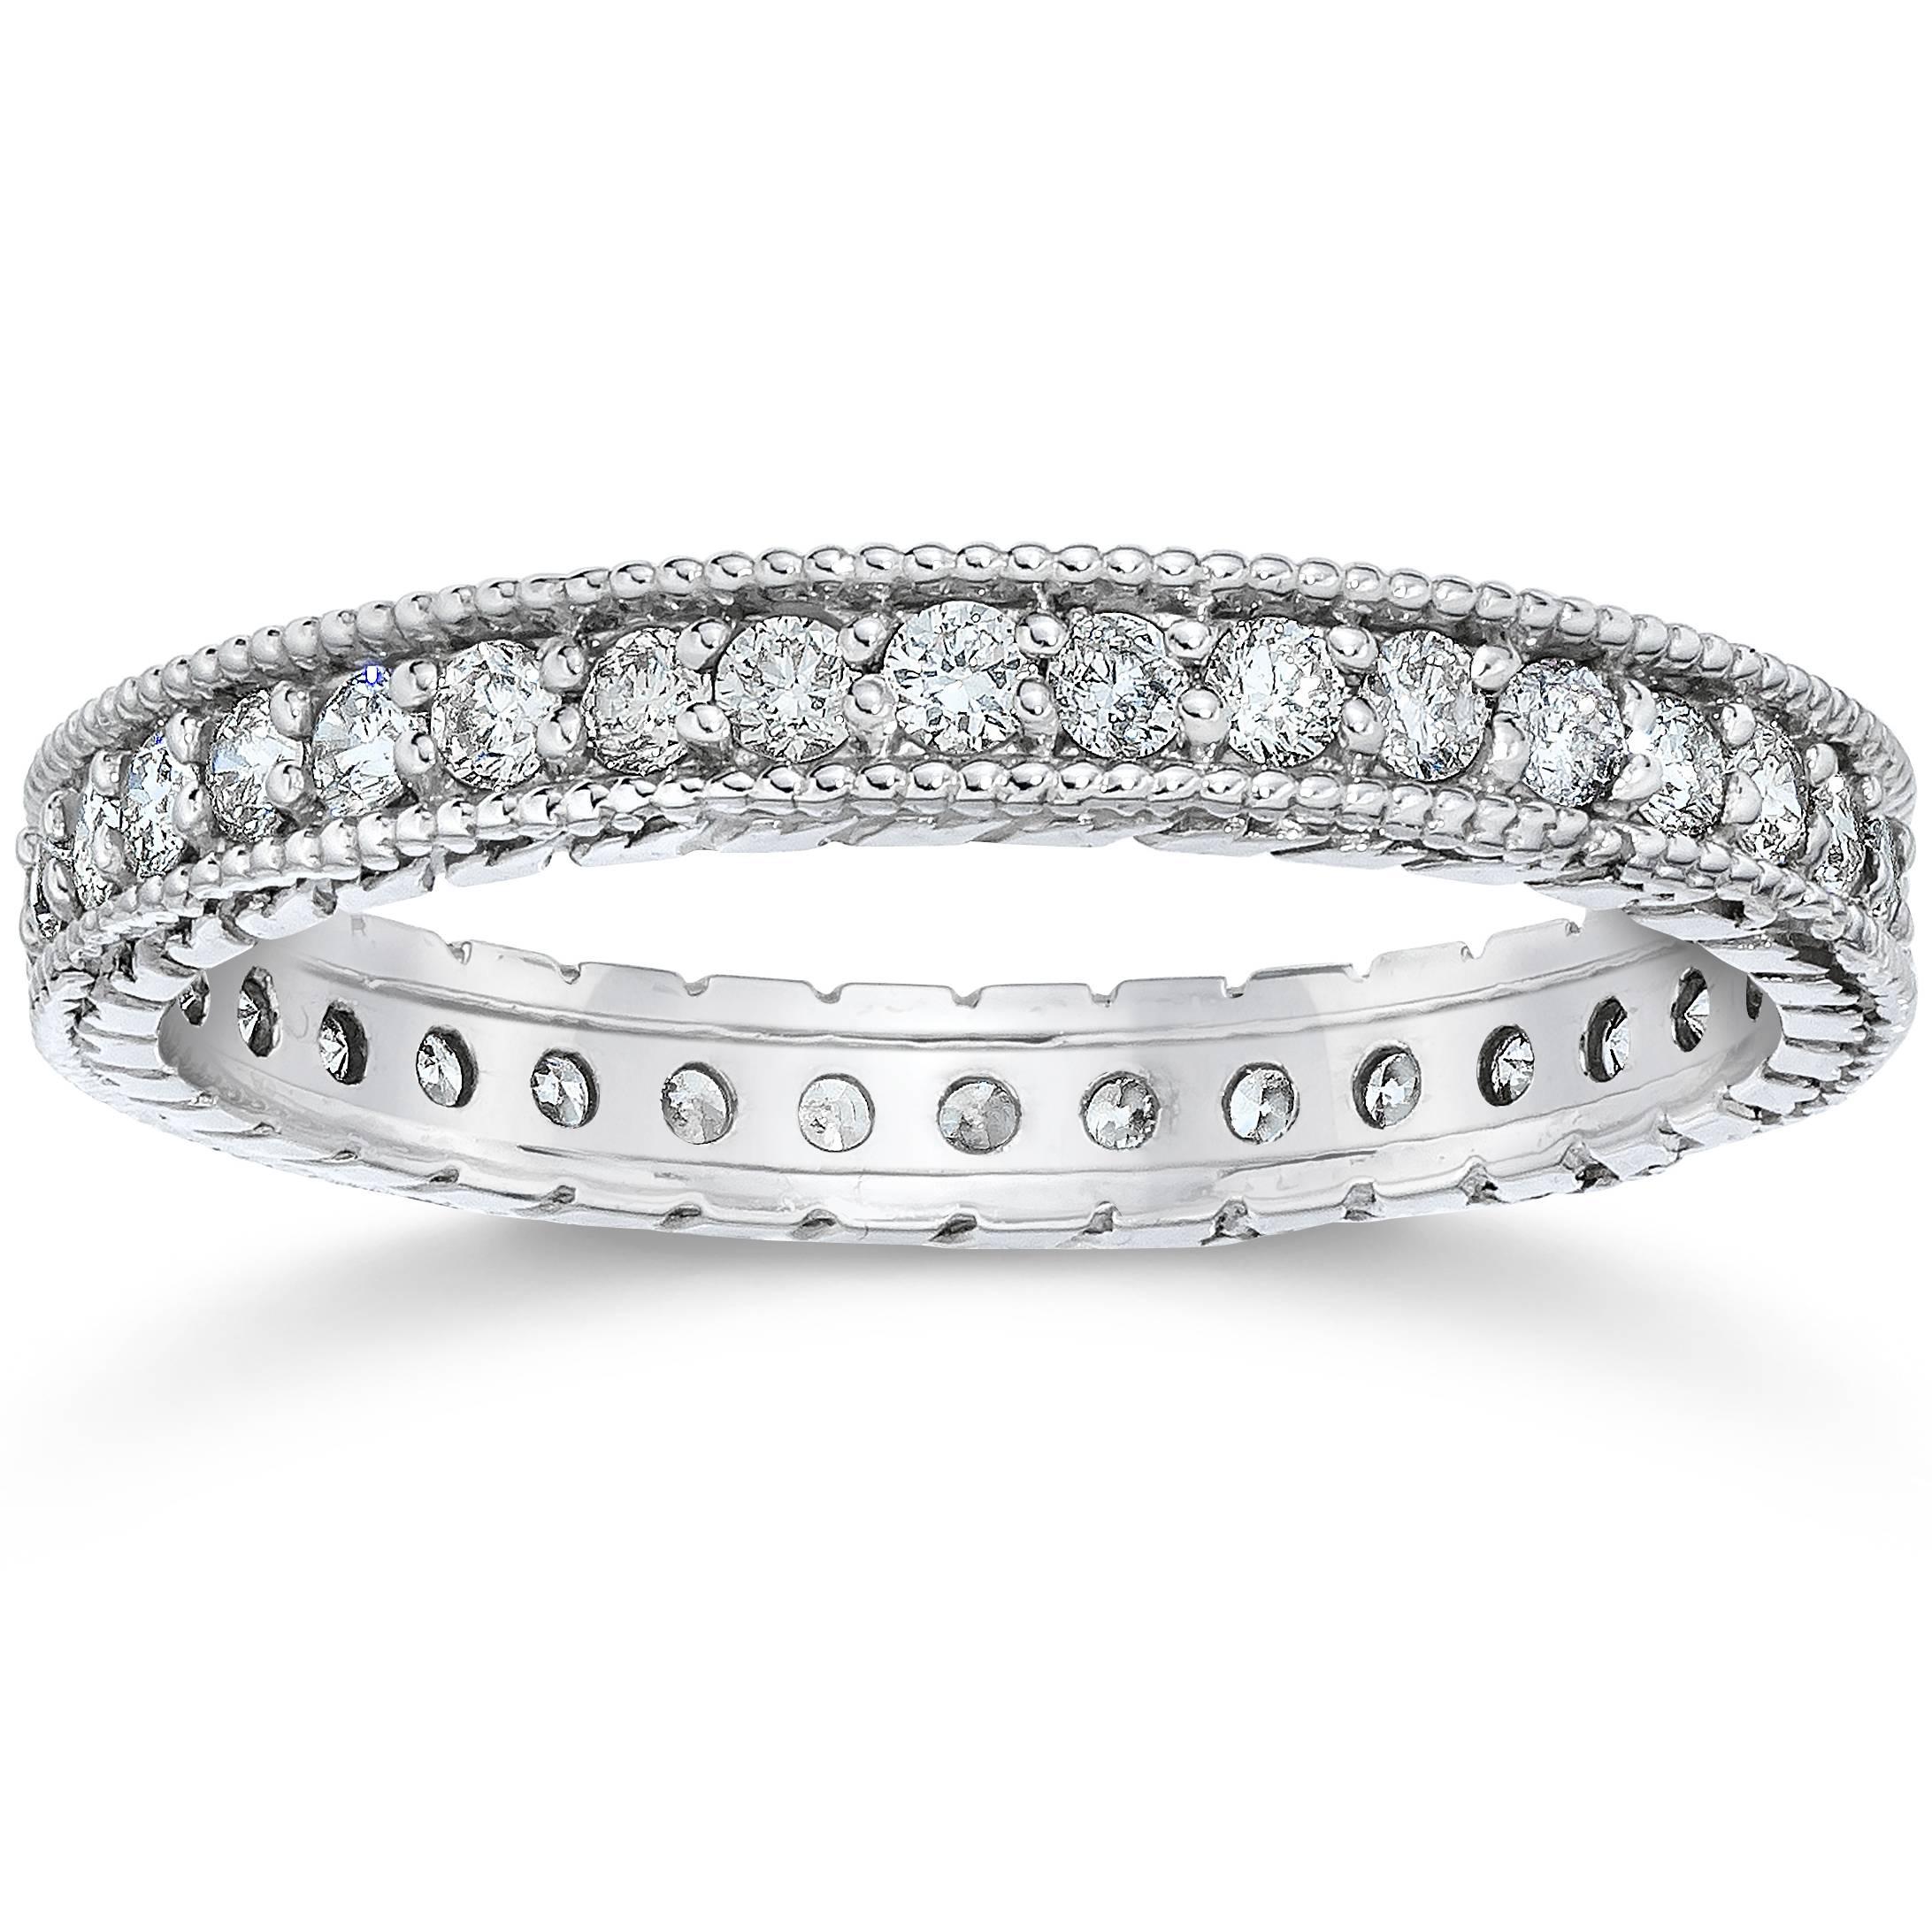 5 8ct vintage diamond hand engraved eternity ring 14k. Black Bedroom Furniture Sets. Home Design Ideas